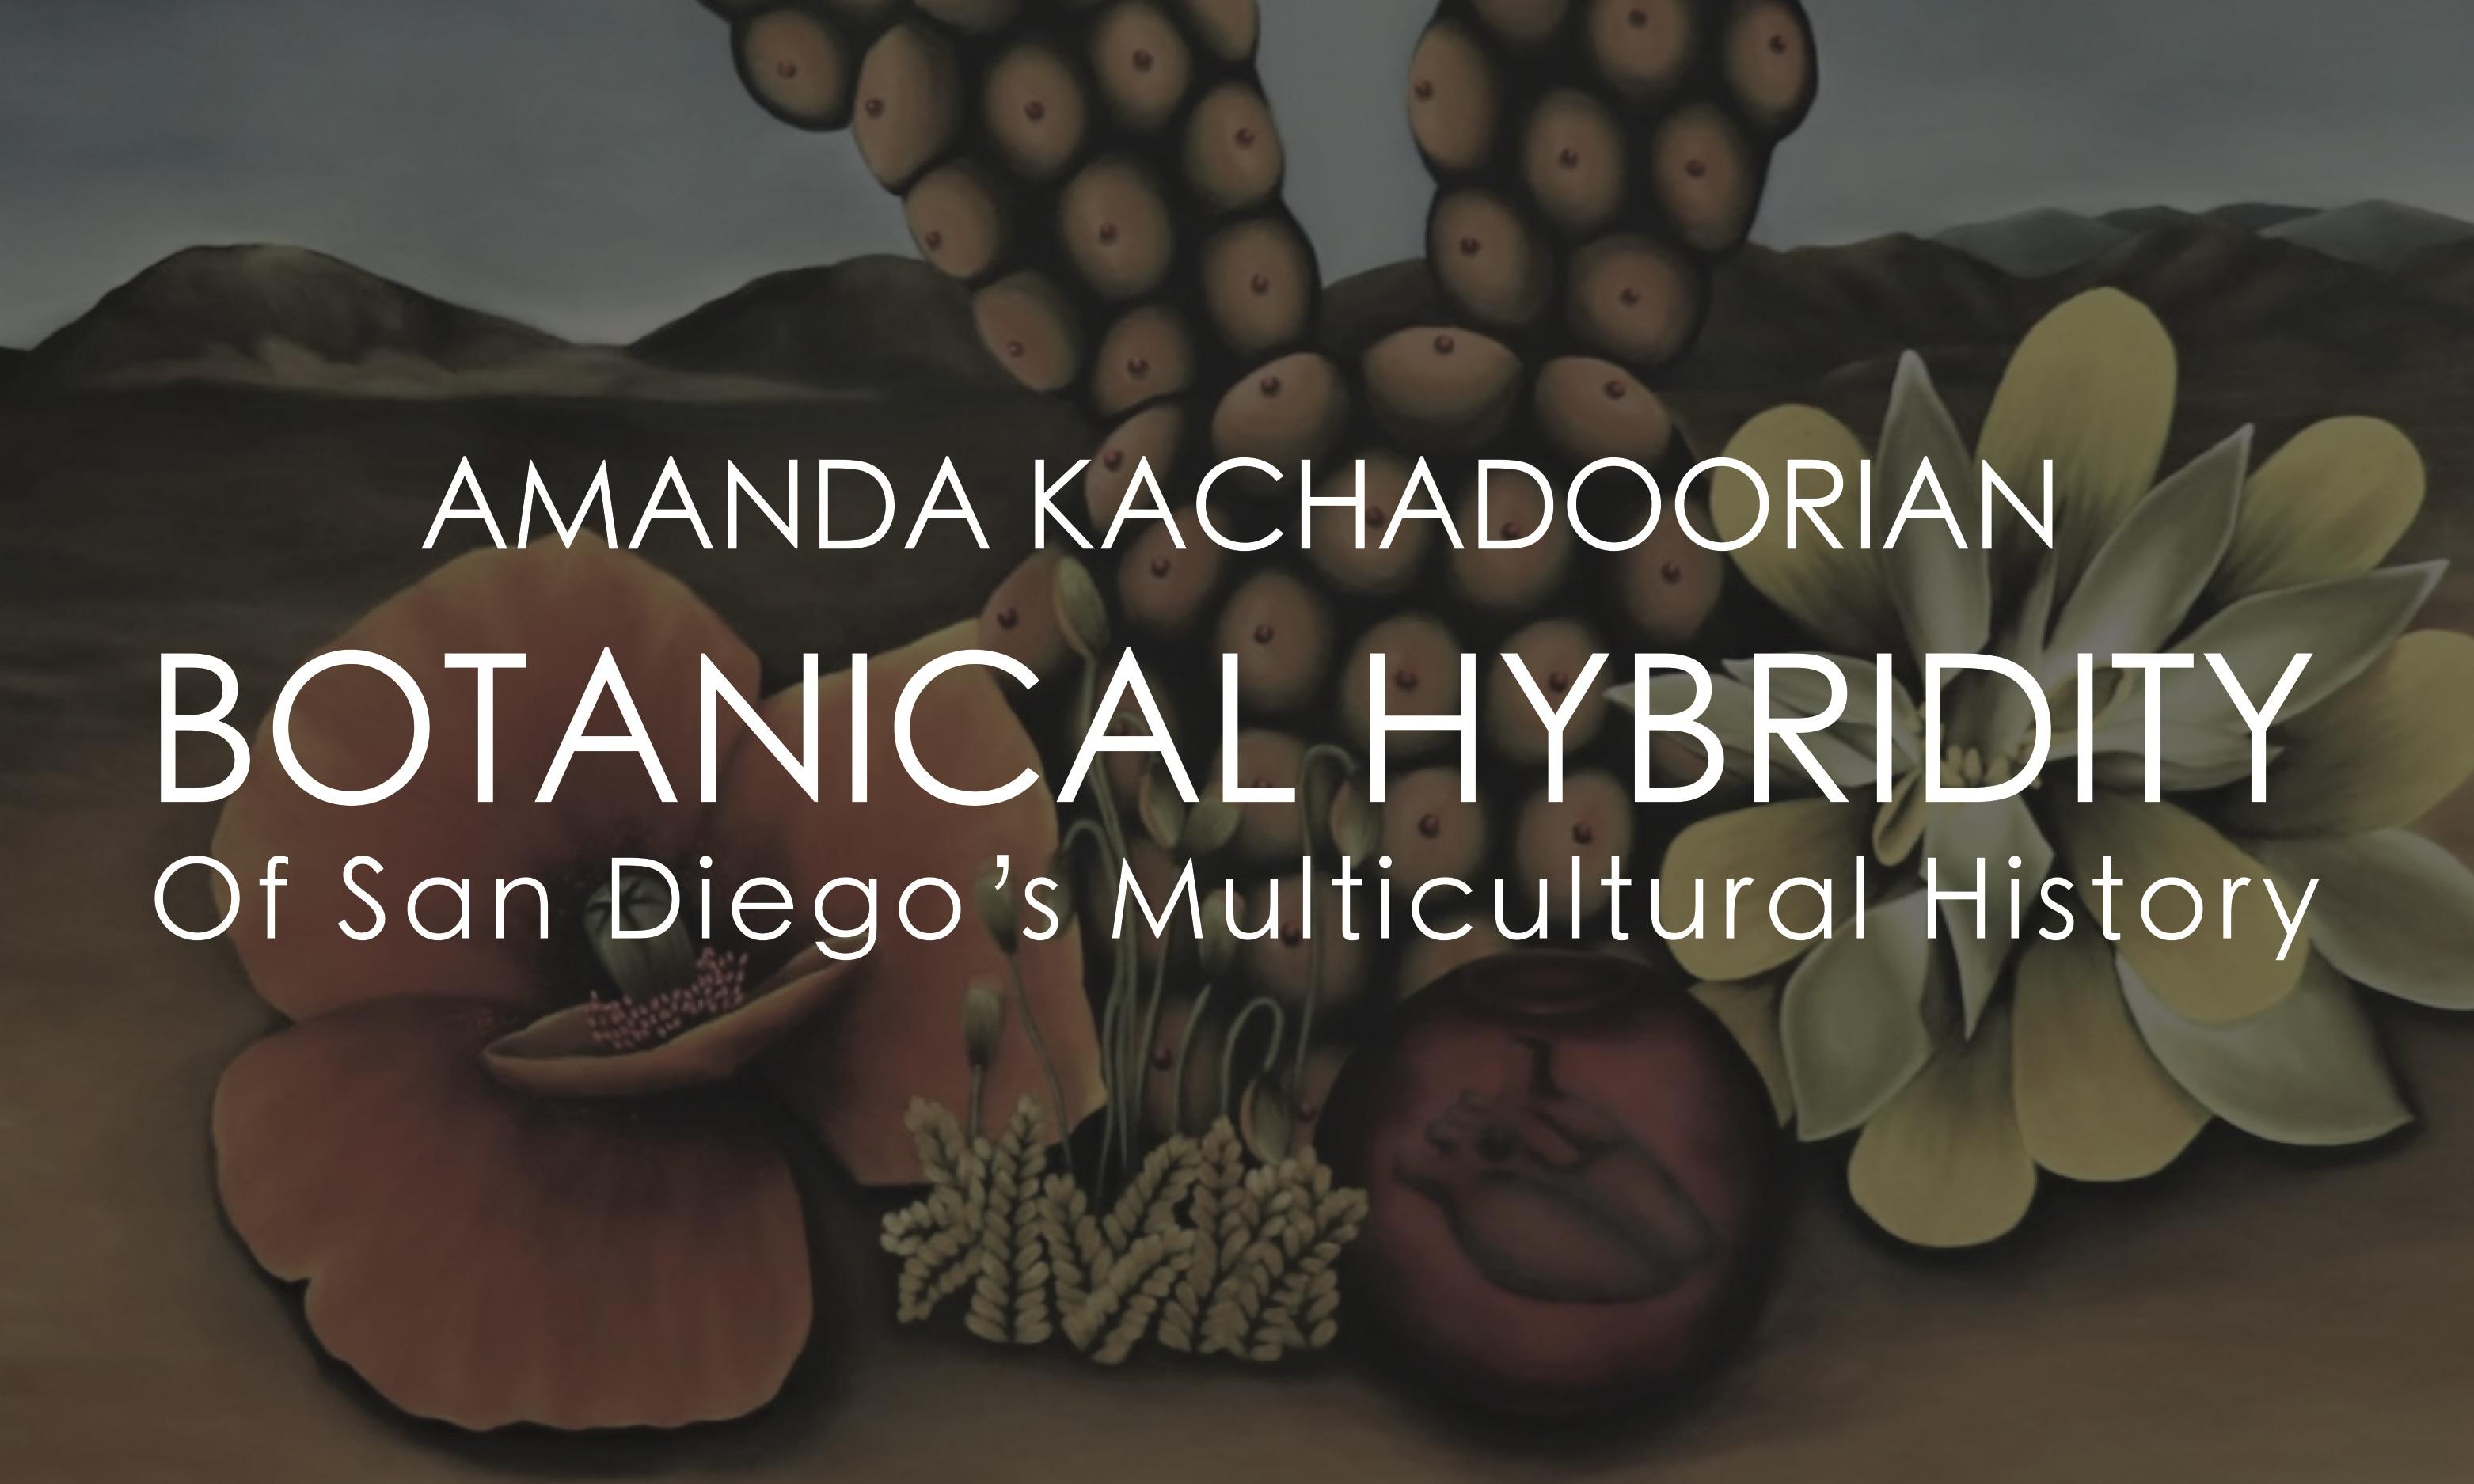 Amanda Kachadoorian: Botanical Hybridity of San Diego's Multicultural History